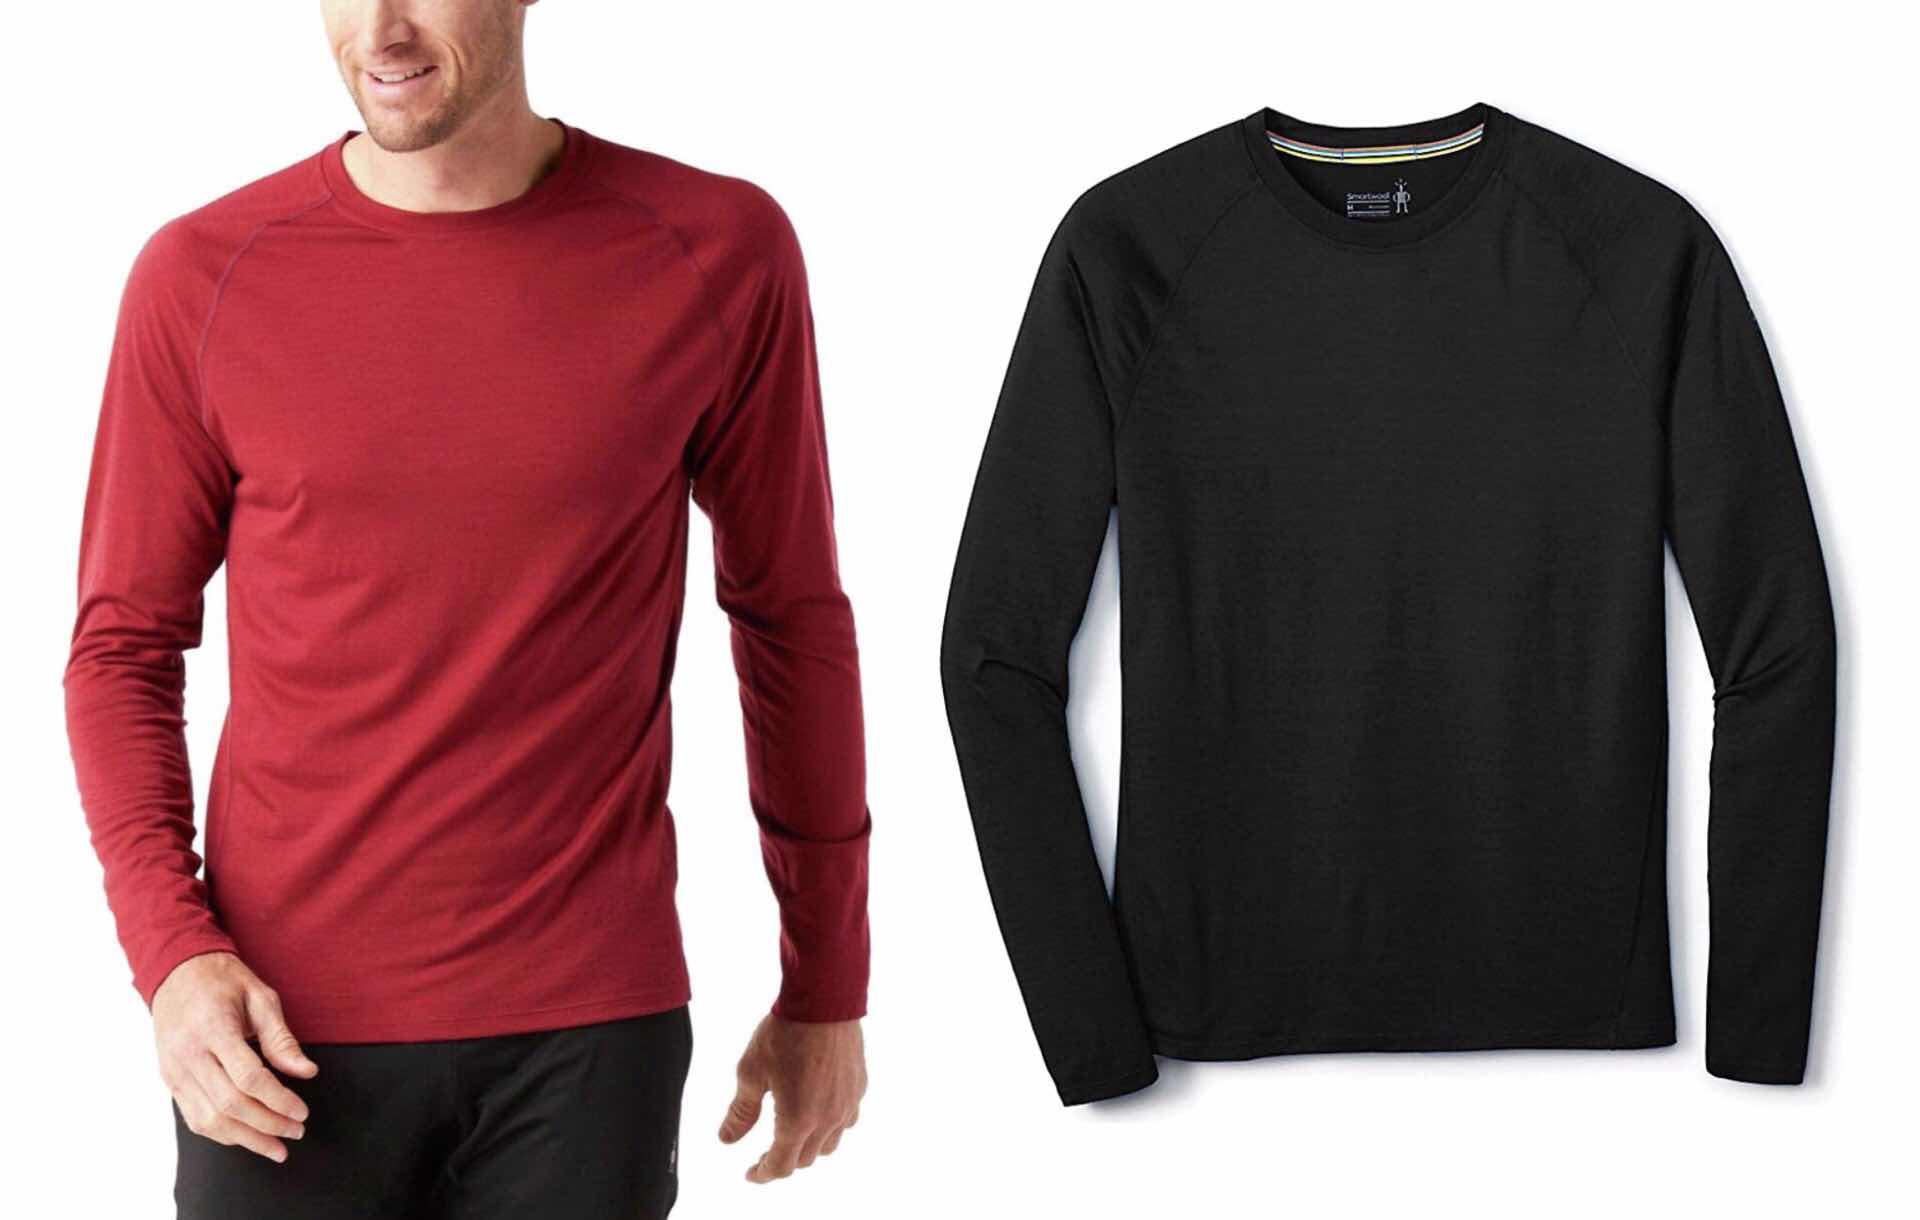 smartwool-mens-merino-150-base-layer-long-sleeve